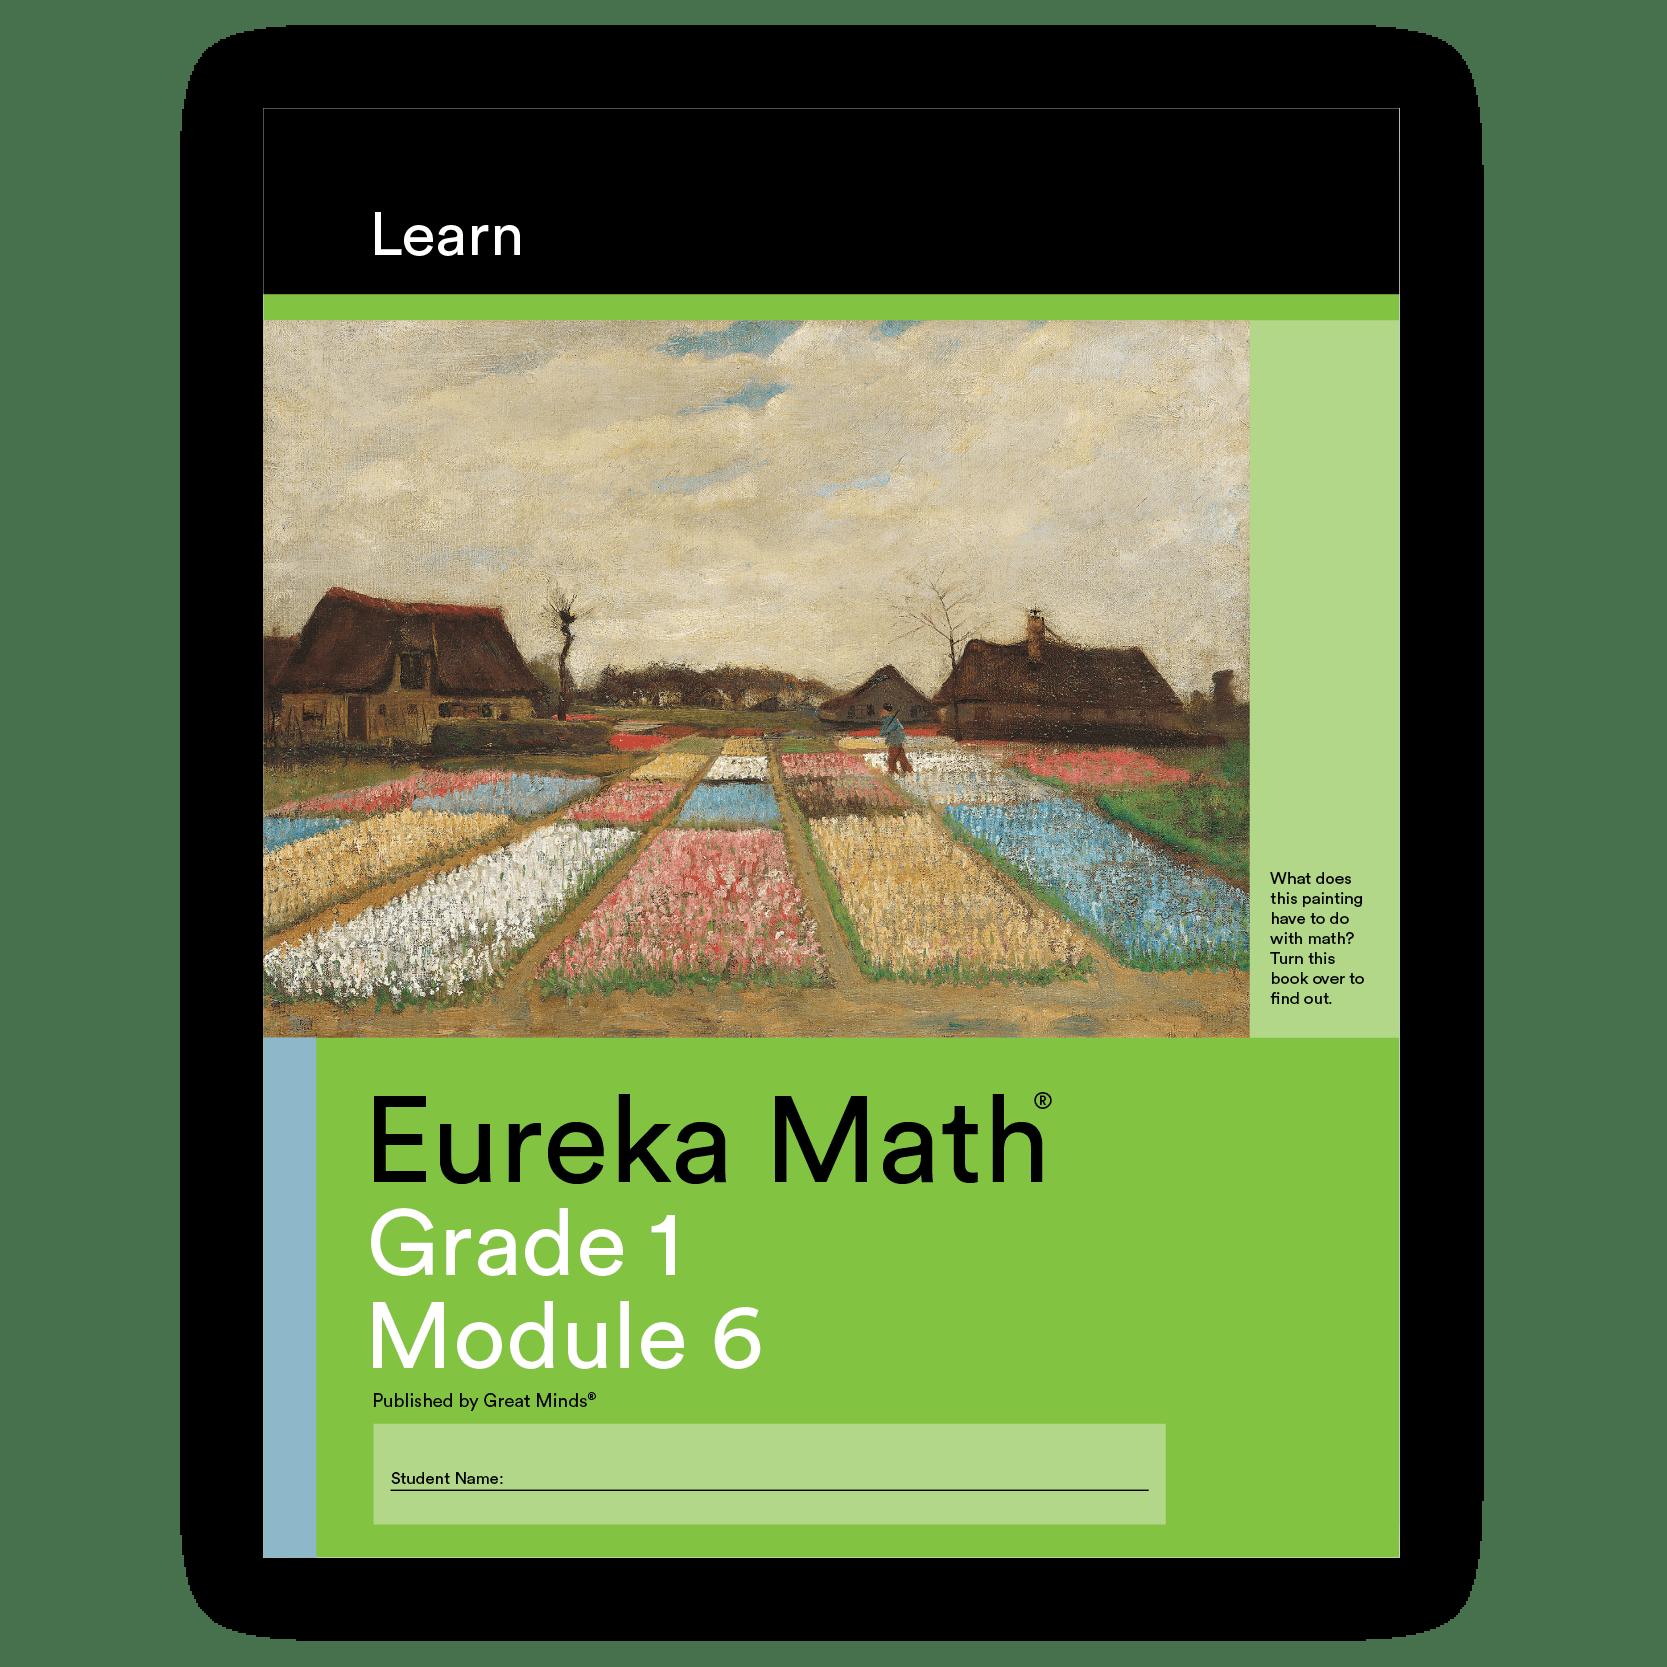 Eureka-Math-LPS-Learn-Sample